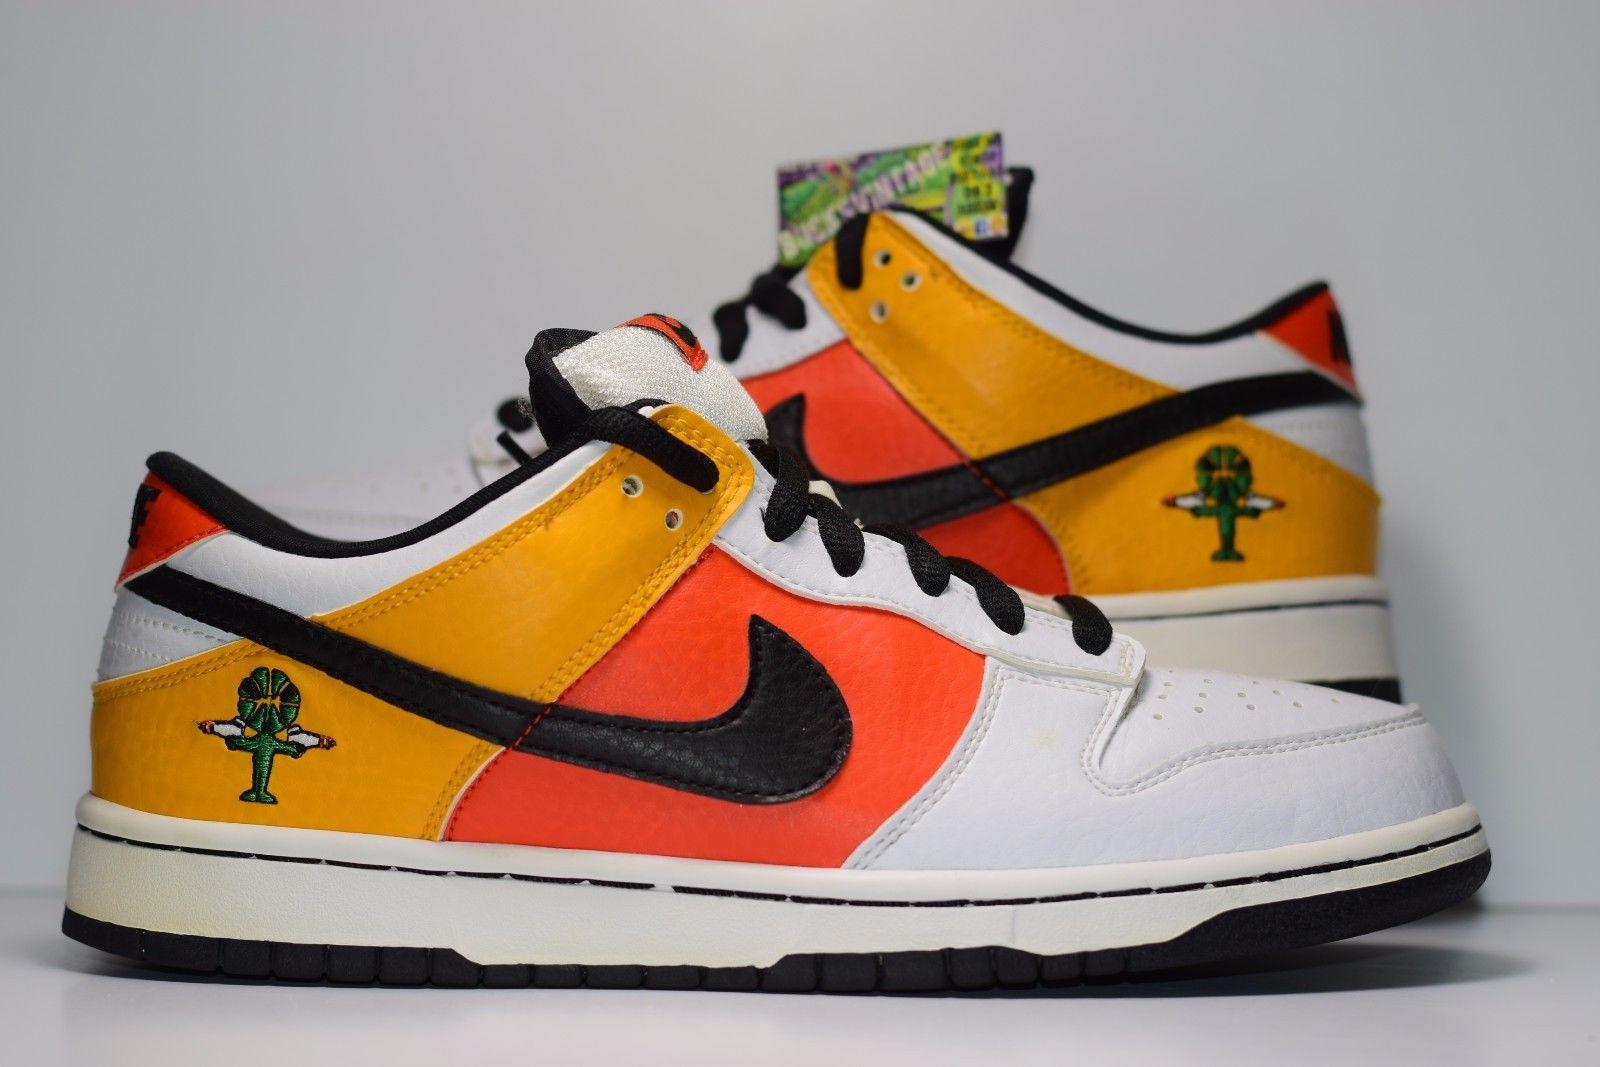 promo code 7ee4d 36ba4 Size 9 2004 Nike Dunk SB Low RAYGUN AWAY